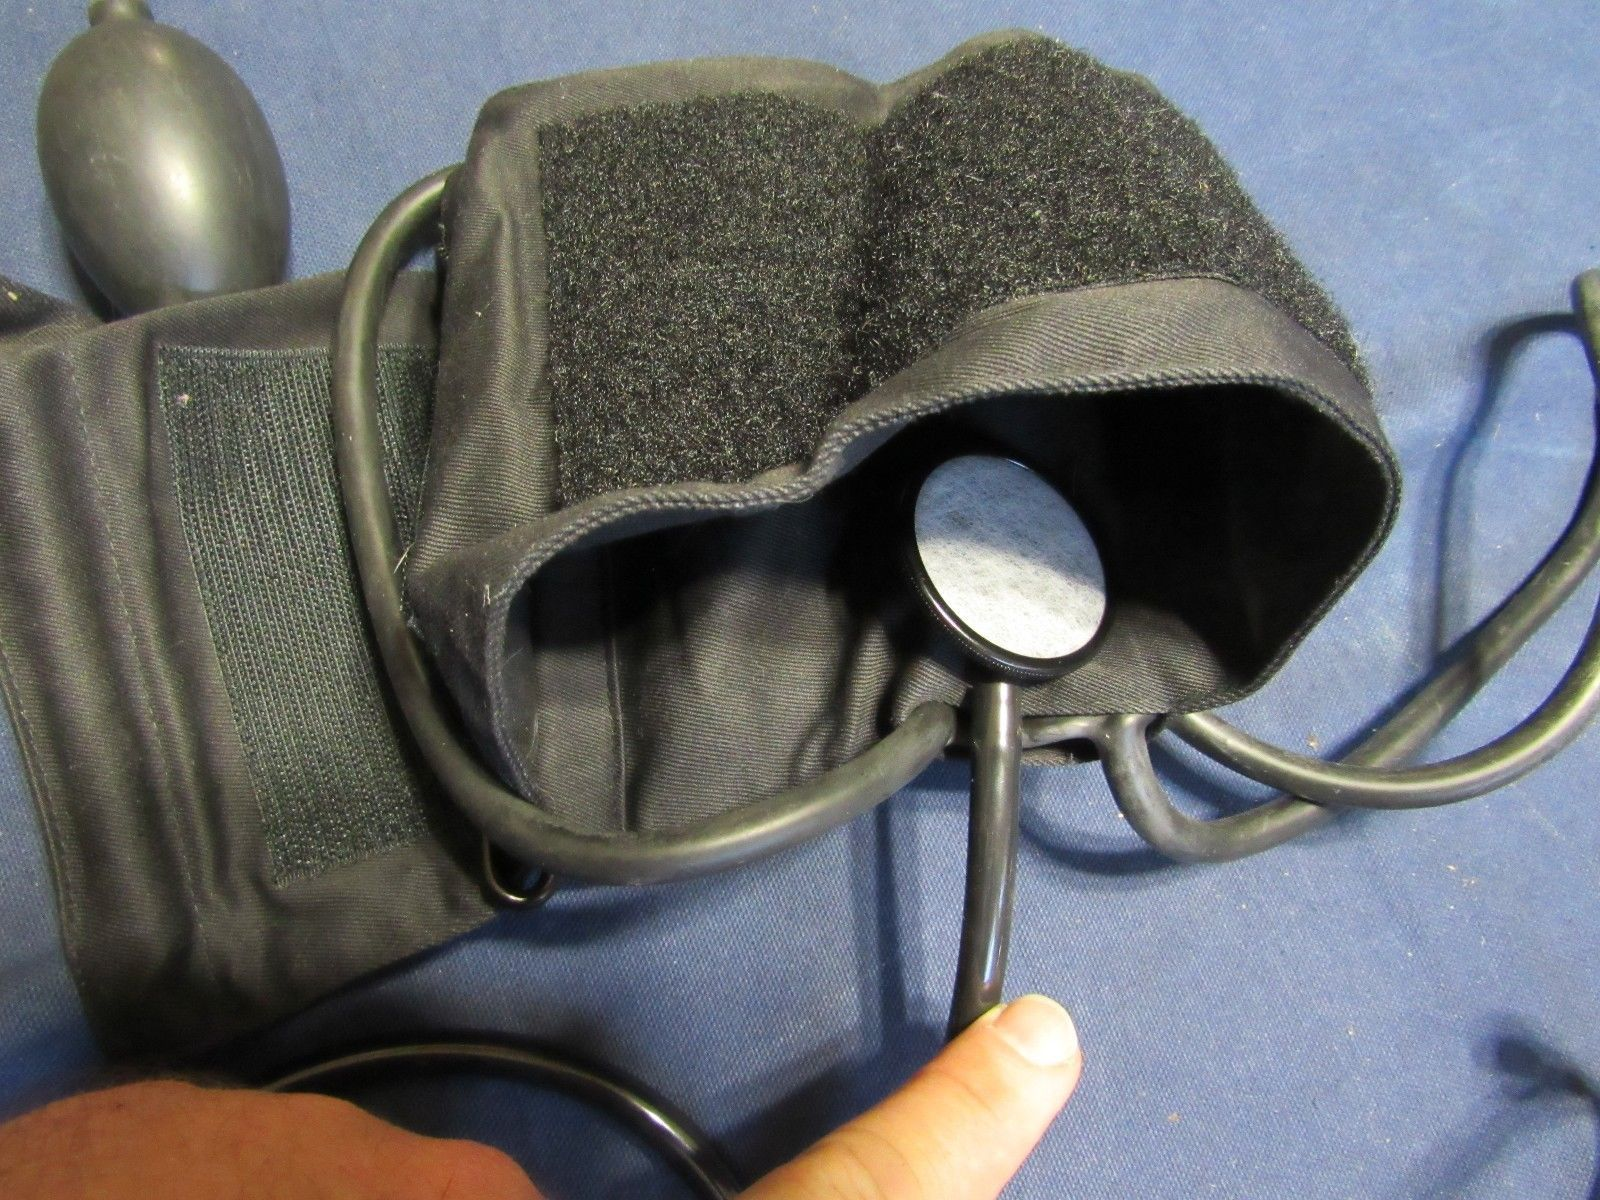 Prestige Medical Adult Aneroid Sphygmomanometer (Blood Pressure Cuff)- Nursing